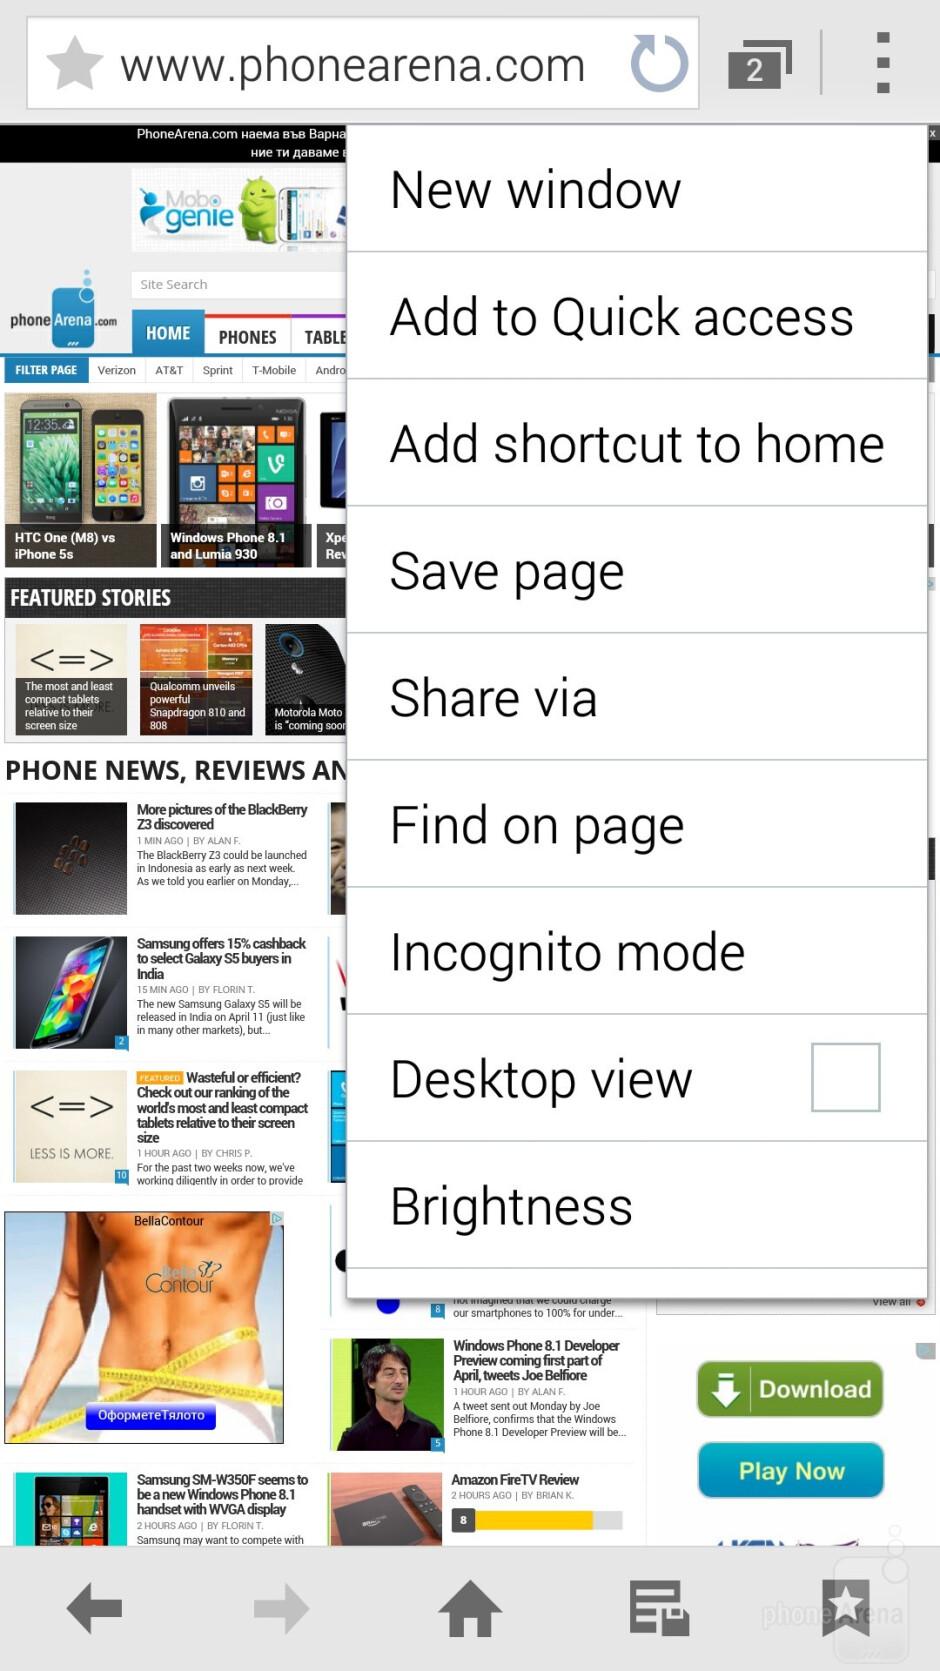 Browsing the web on the Samsung Galaxy S5 - Samsung Galaxy S5 vs Nokia Lumia 1520